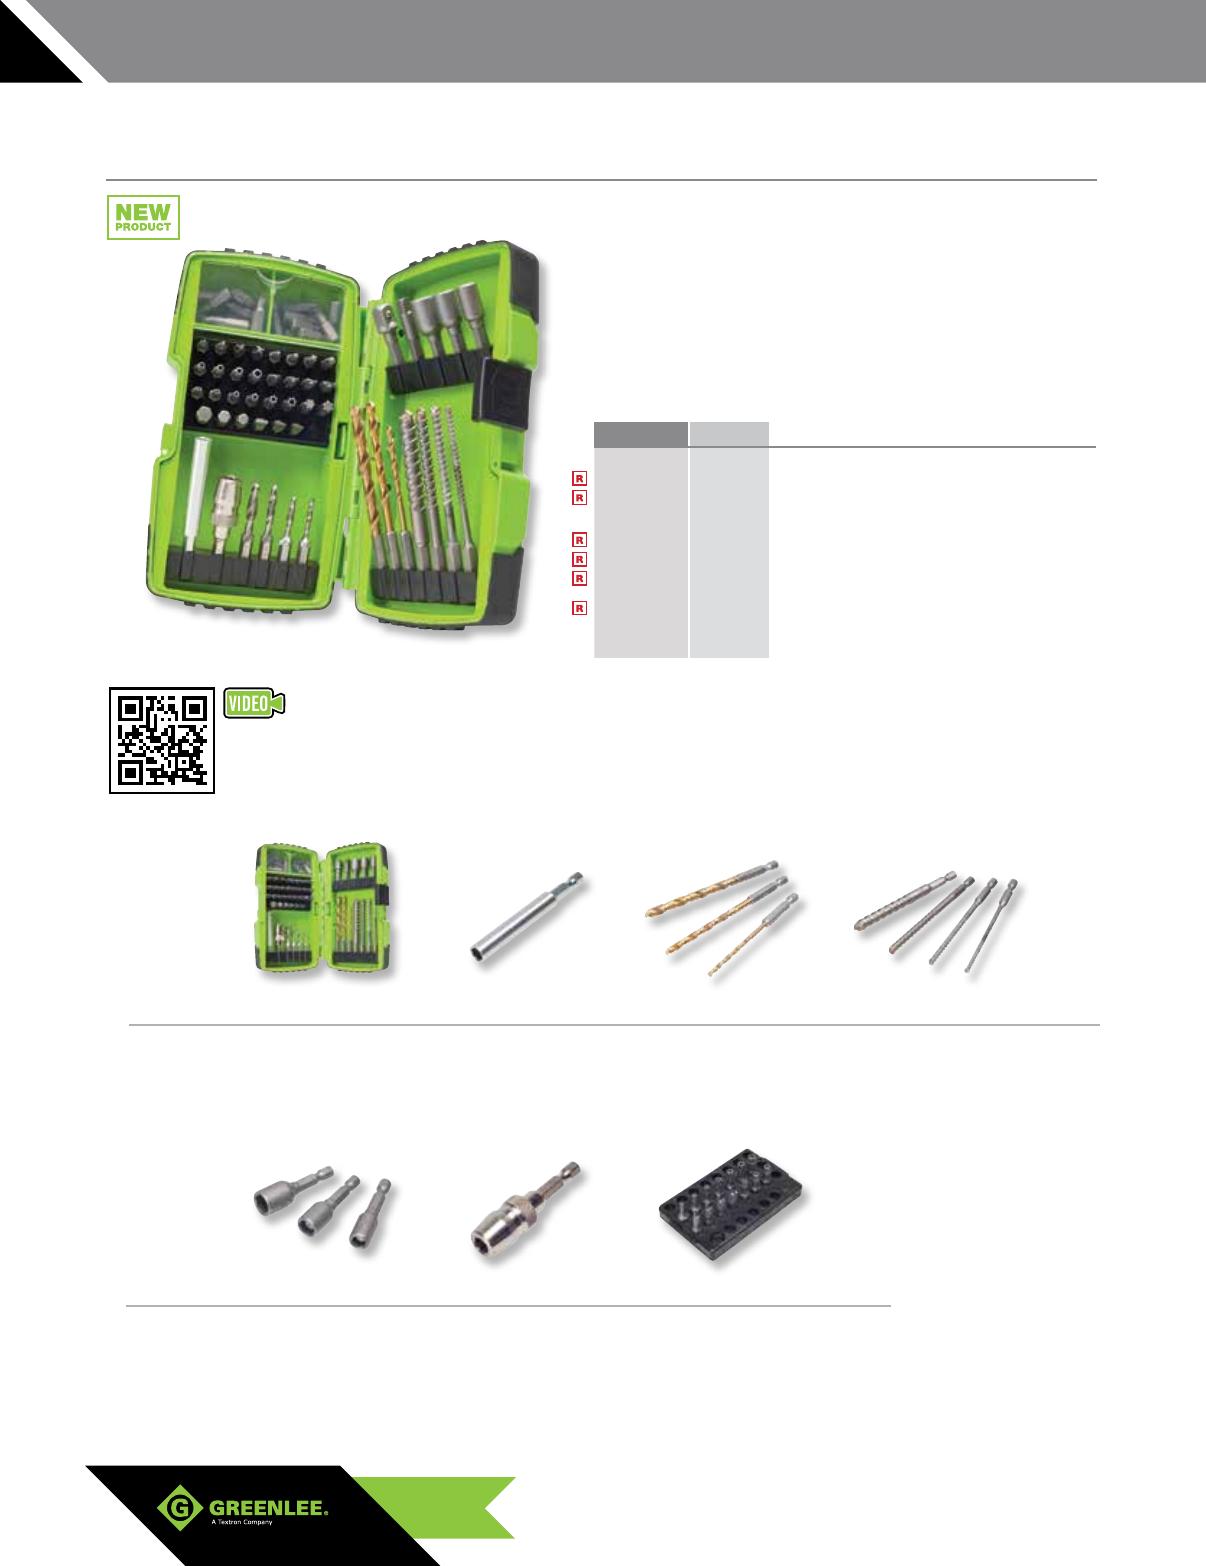 Greenlee 33A-7//8 Spade Bit 7//8-Inch 6-1//4-Inch Length